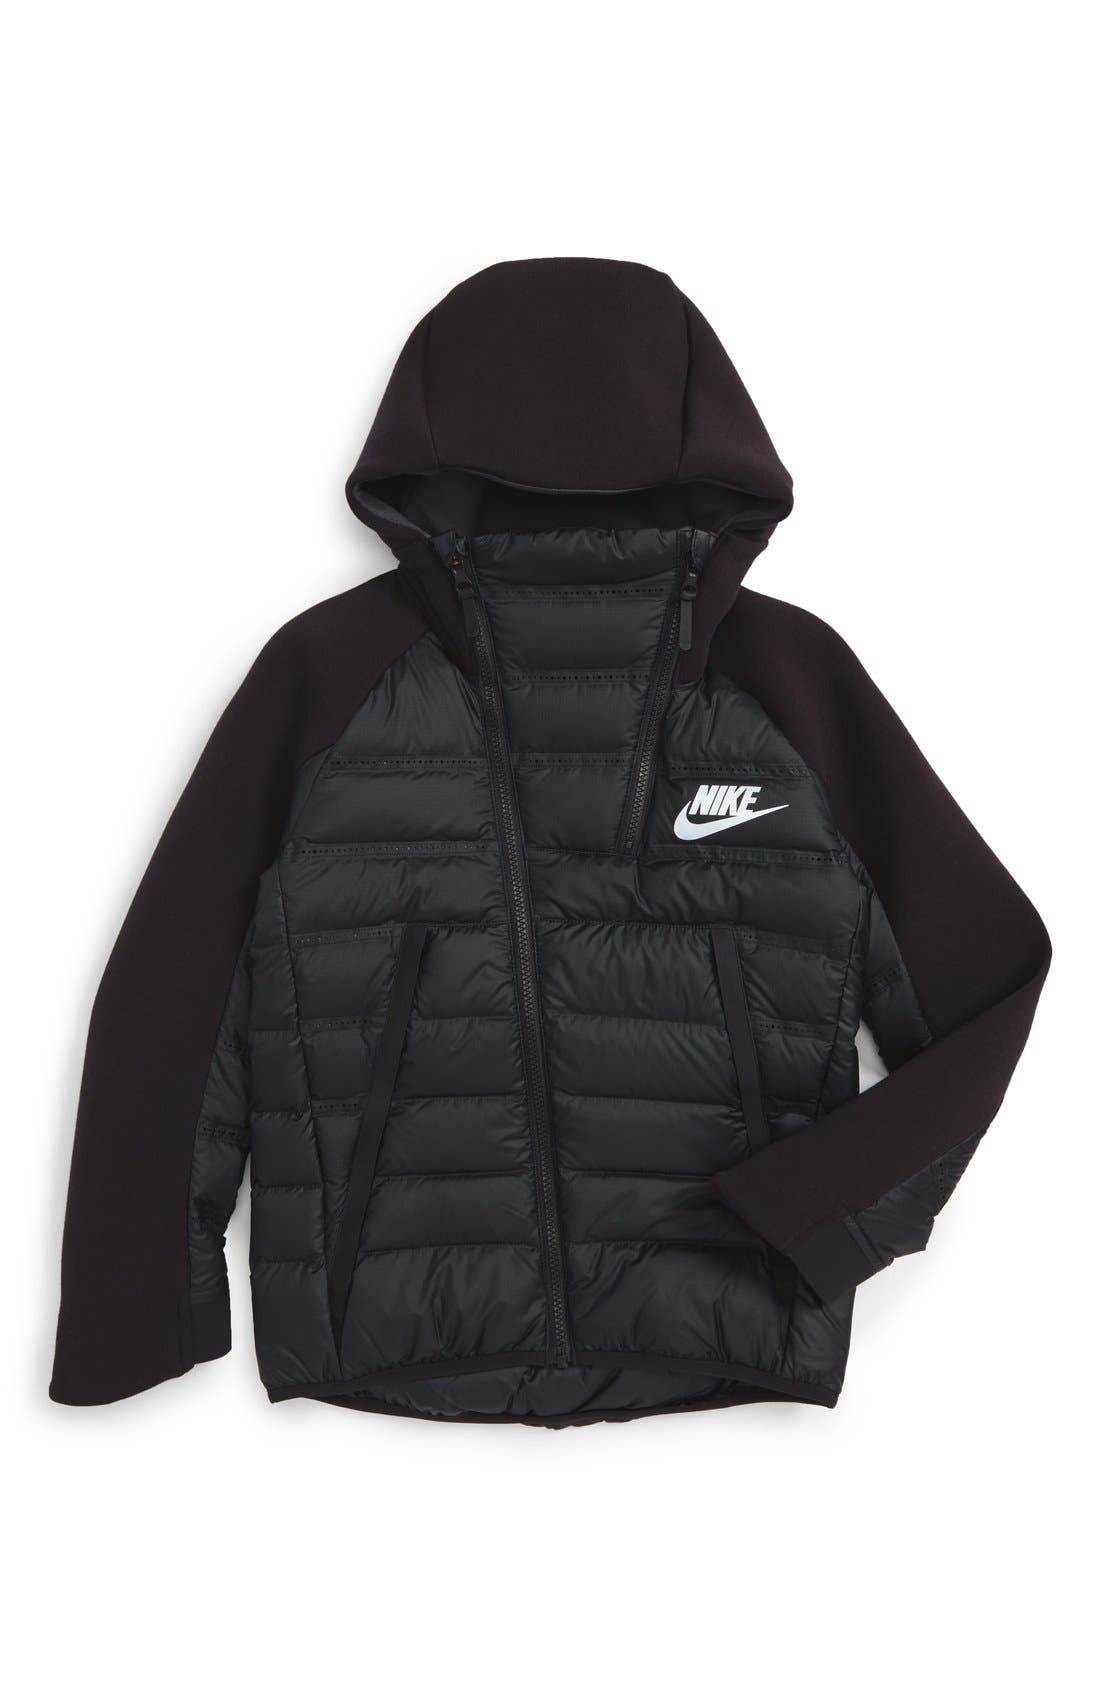 Sportswear Tech Fleece AeroLoft Jacket,                             Main thumbnail 1, color,                             010